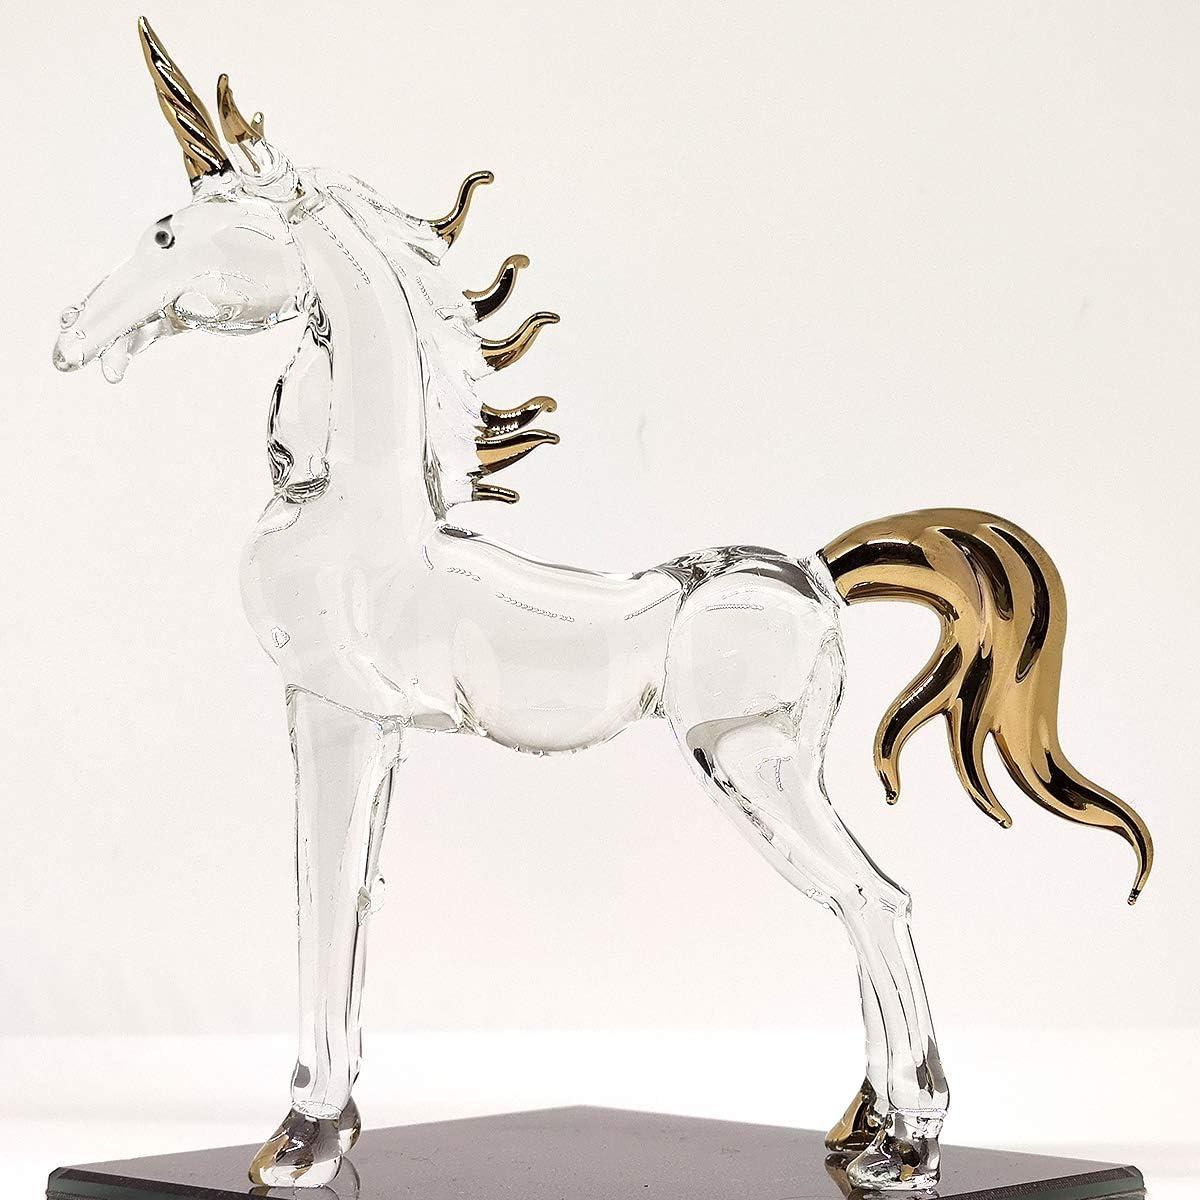 unisex Sansukjai 6 Inches Unicorn Minneapolis Mall Miniature Hand Glass Blown Figurines